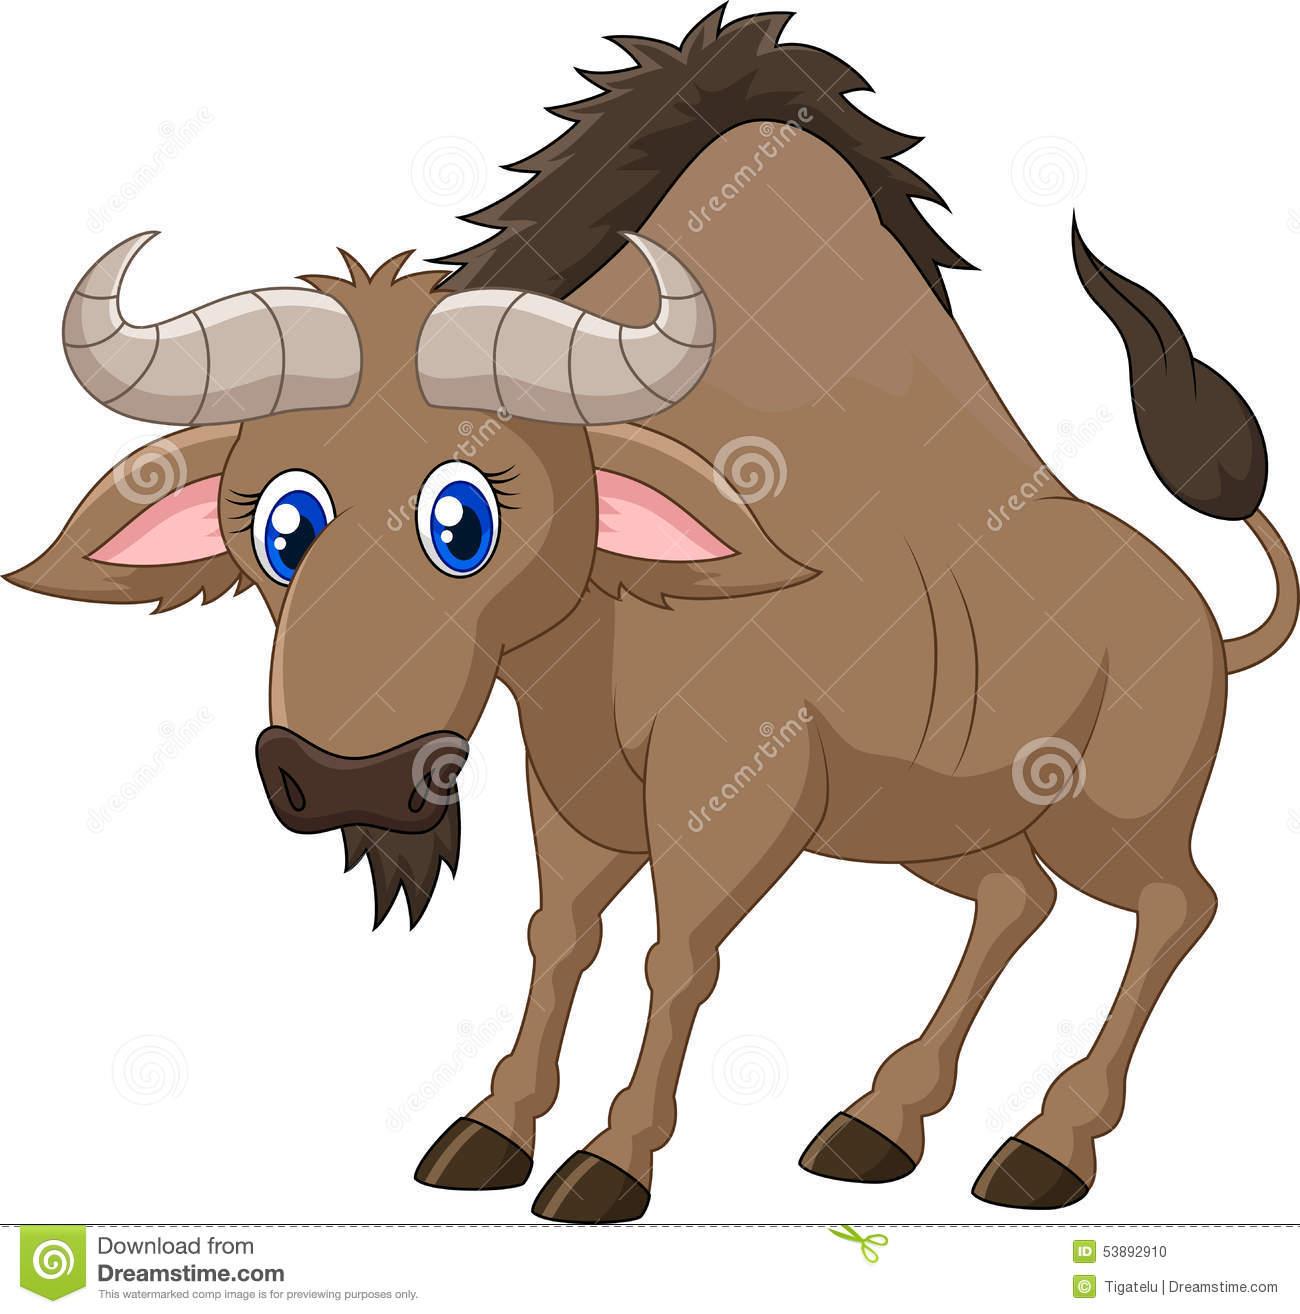 Wildebeest clipart cartoon Images Clipart Wildebeest Clipart wildebeest%20clipart%20